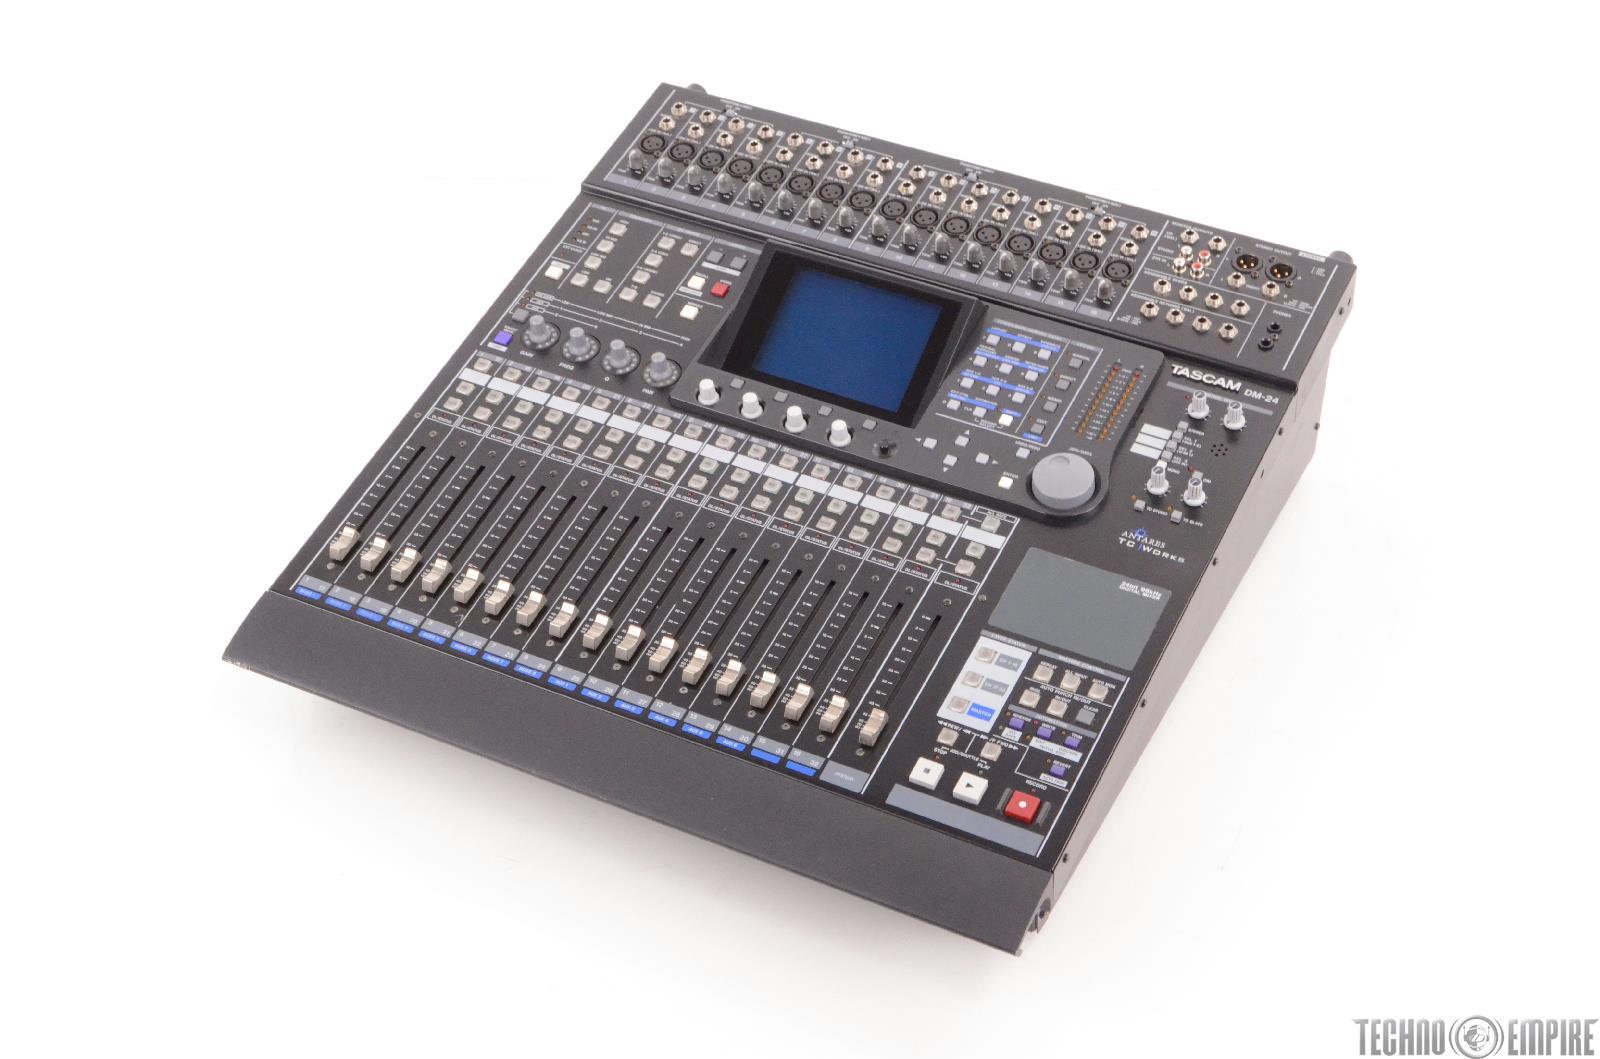 Digital Mixer Tascam : tascam dm 24 24 bit 96 khz digital mixing console mixer 23648 ebay ~ Russianpoet.info Haus und Dekorationen